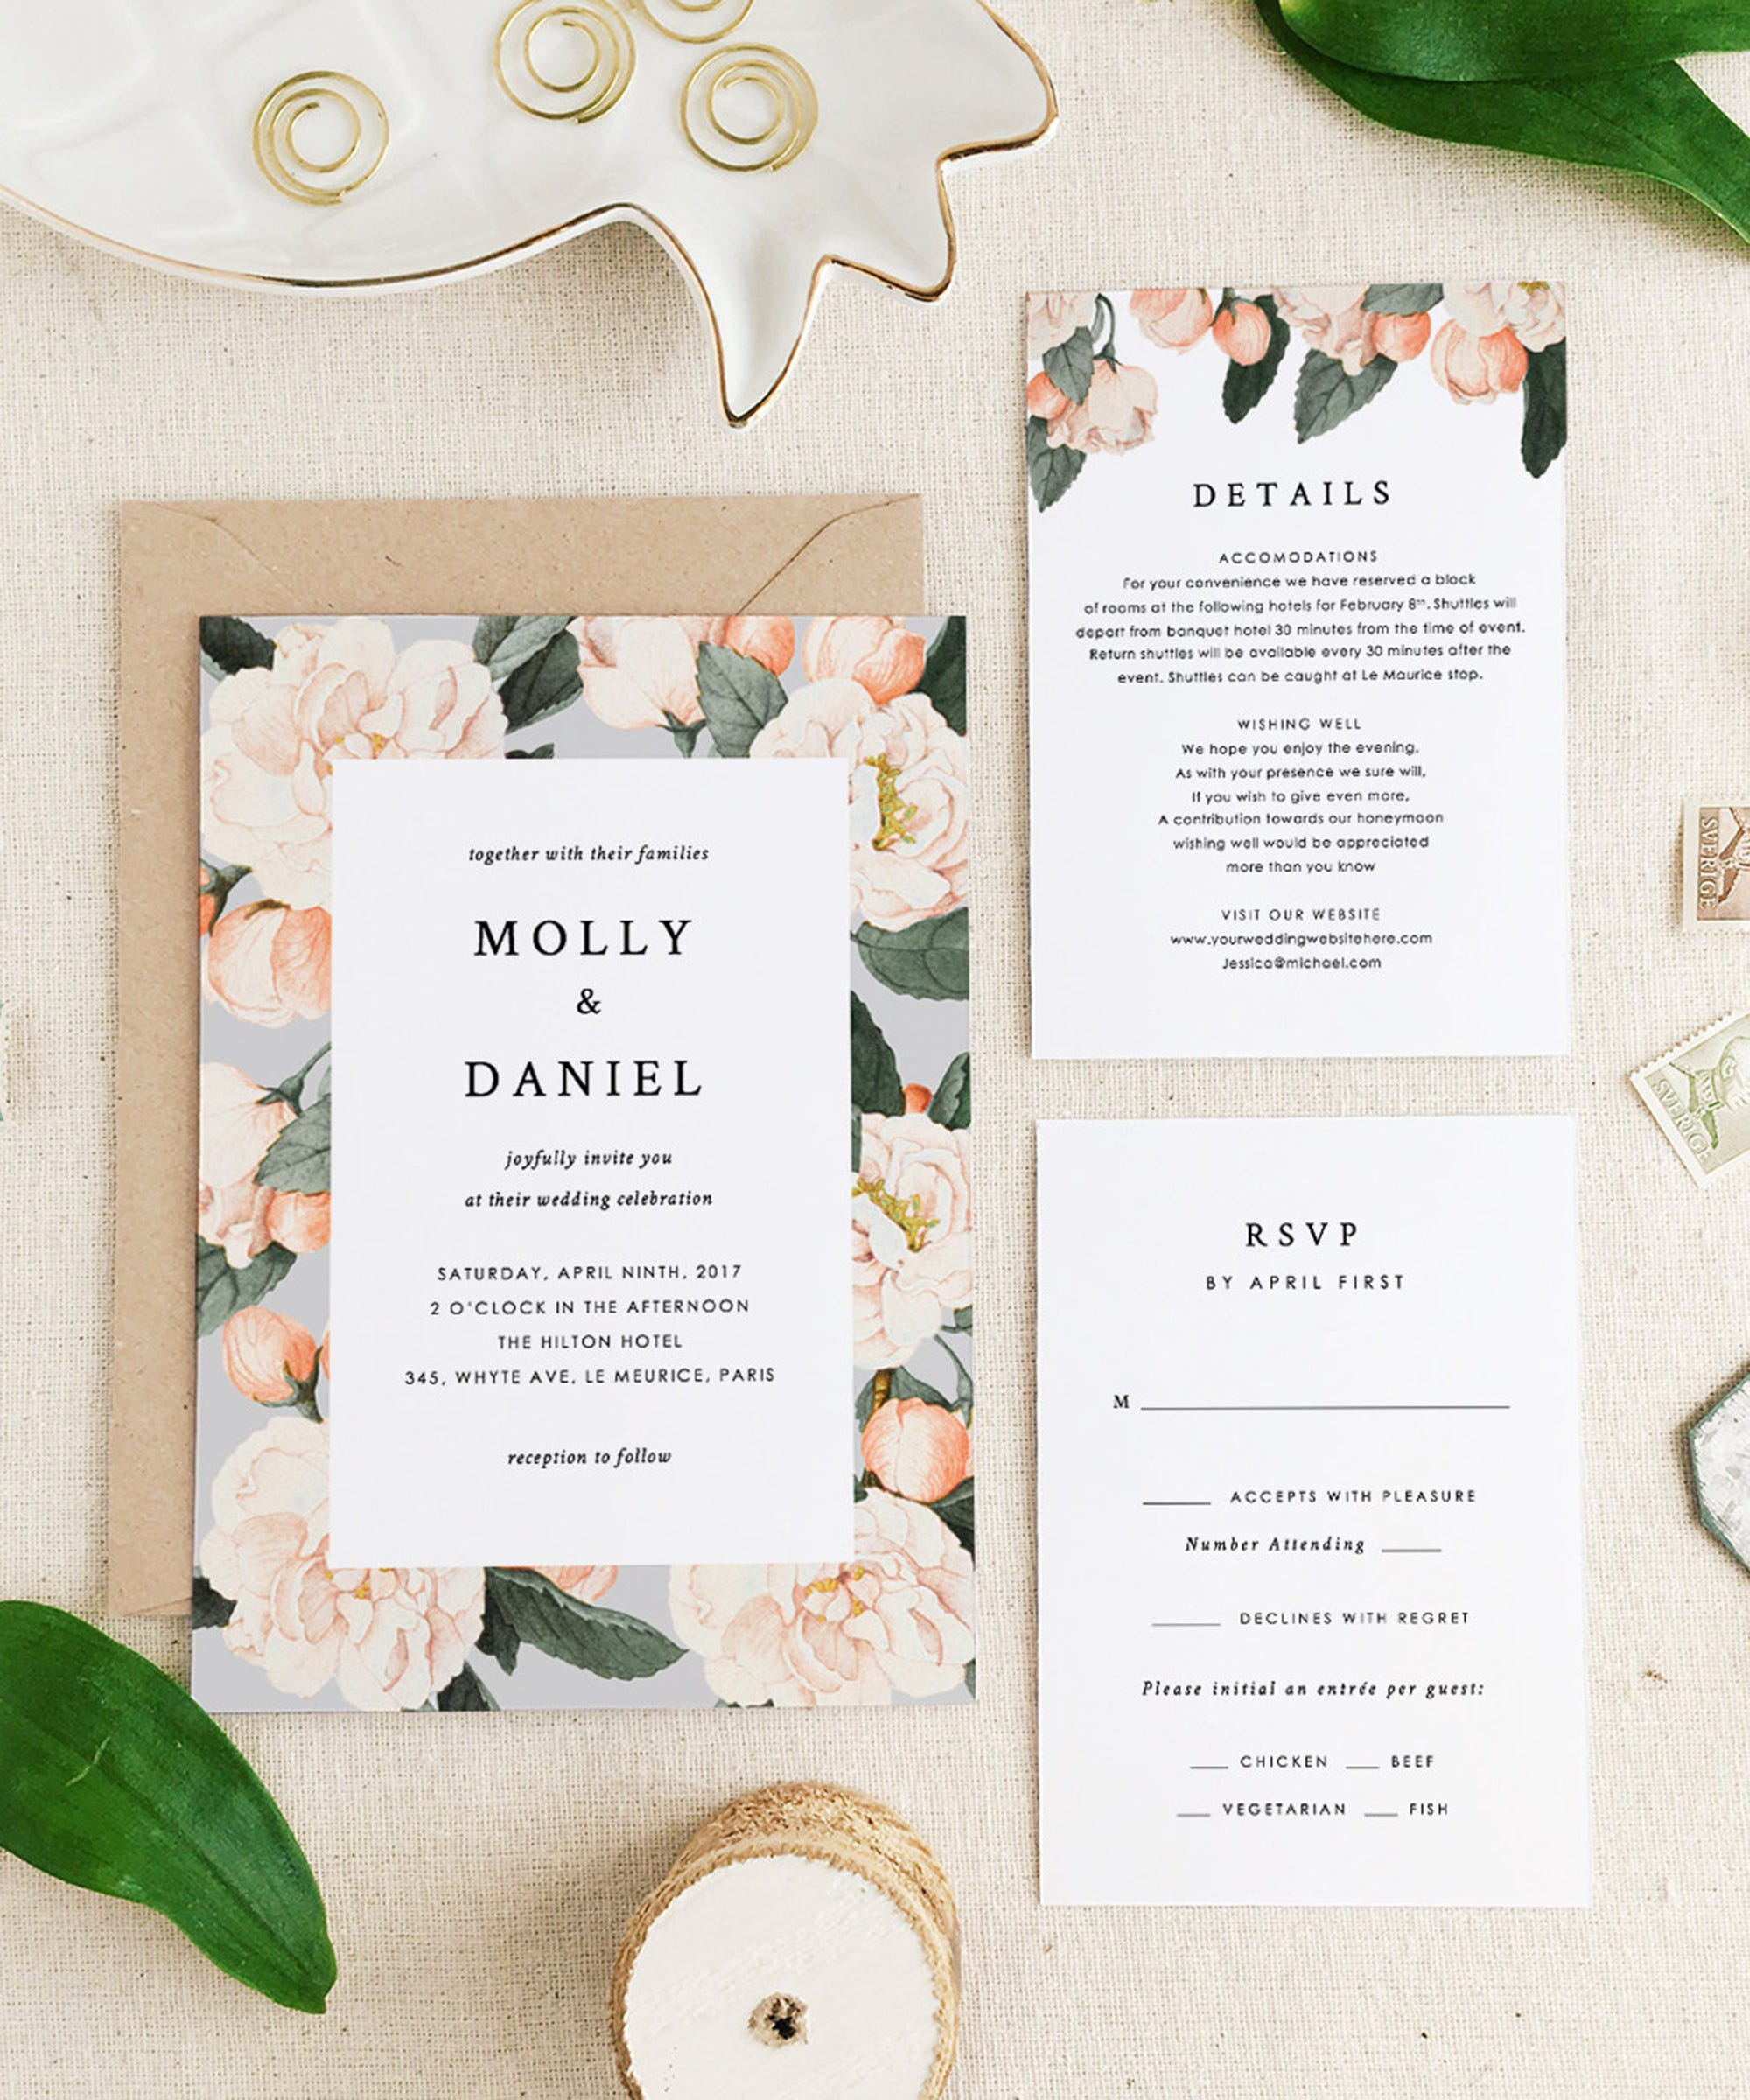 Best etsy wedding invites stationery invitations design monicamarmolfo Choice Image